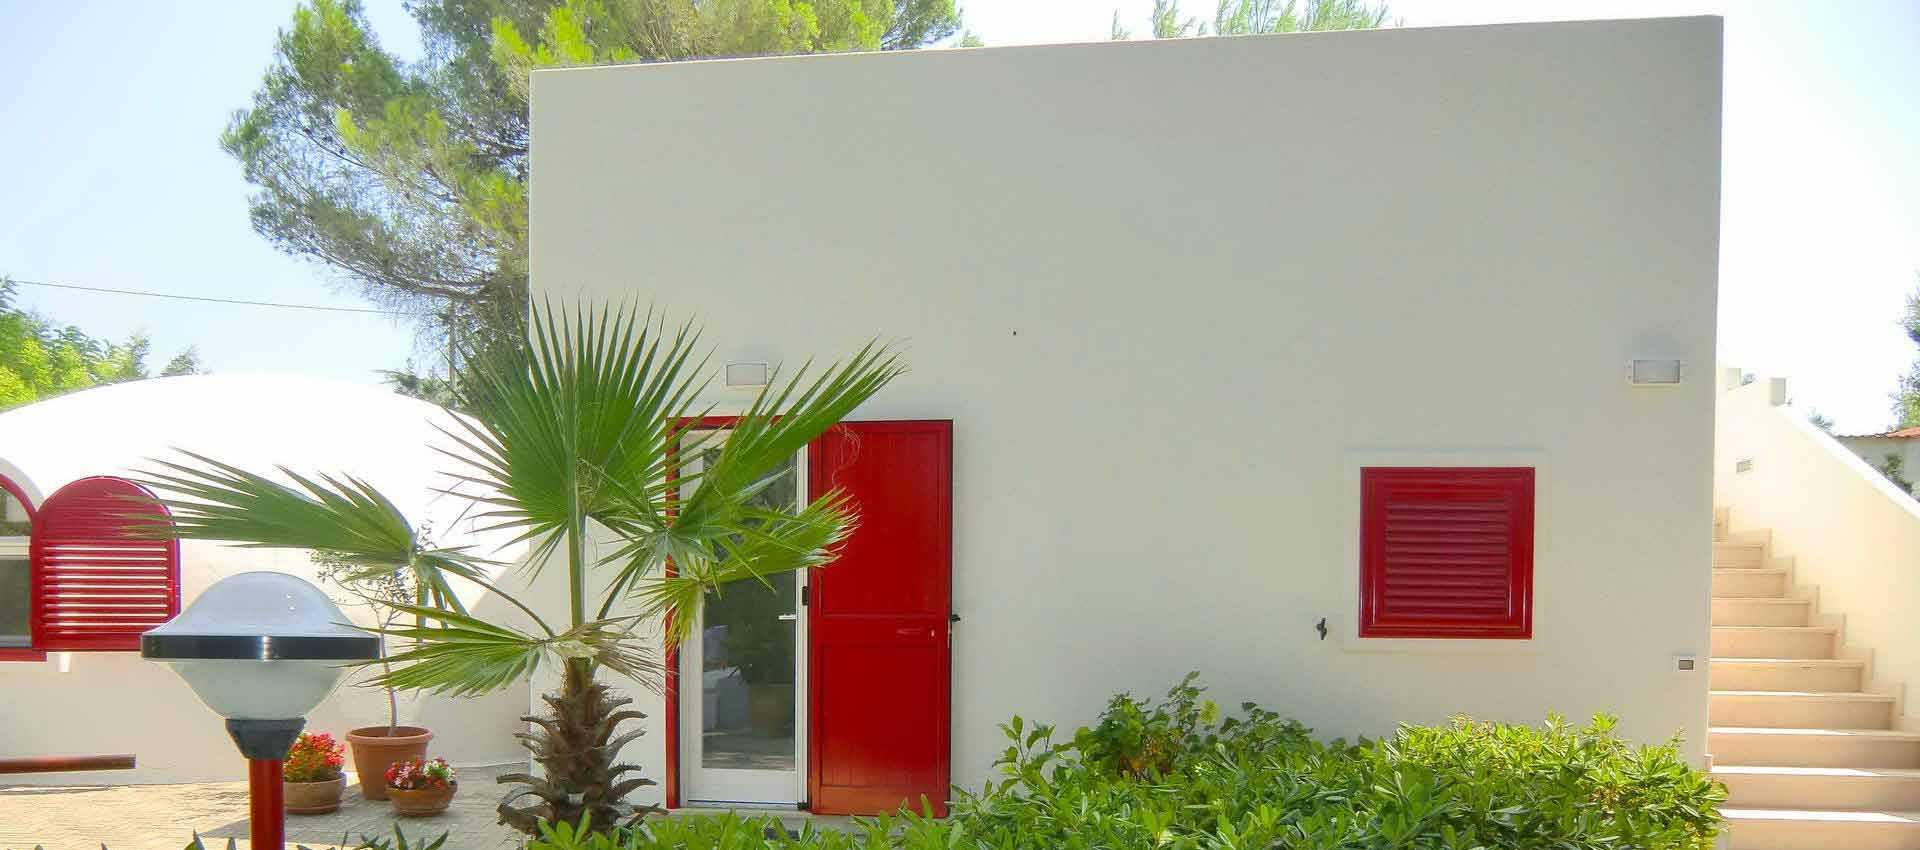 Solicitar presupuesto: Villa Francesca - 30fff-f2e09-73_casa-prefabbricata-villa-francesca.jpg